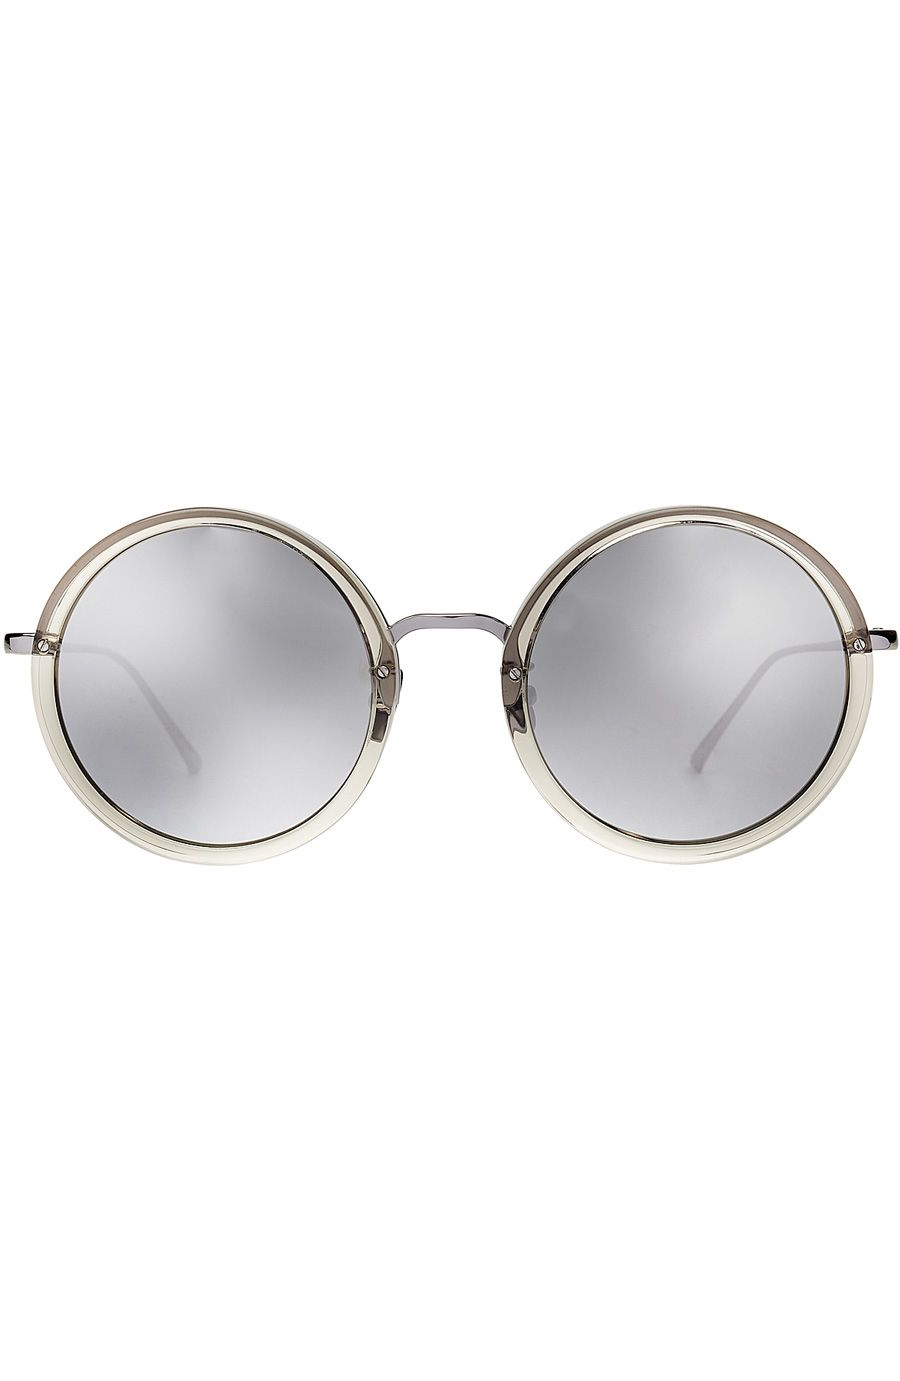 0376c036ed Round Sunglasses detail 0